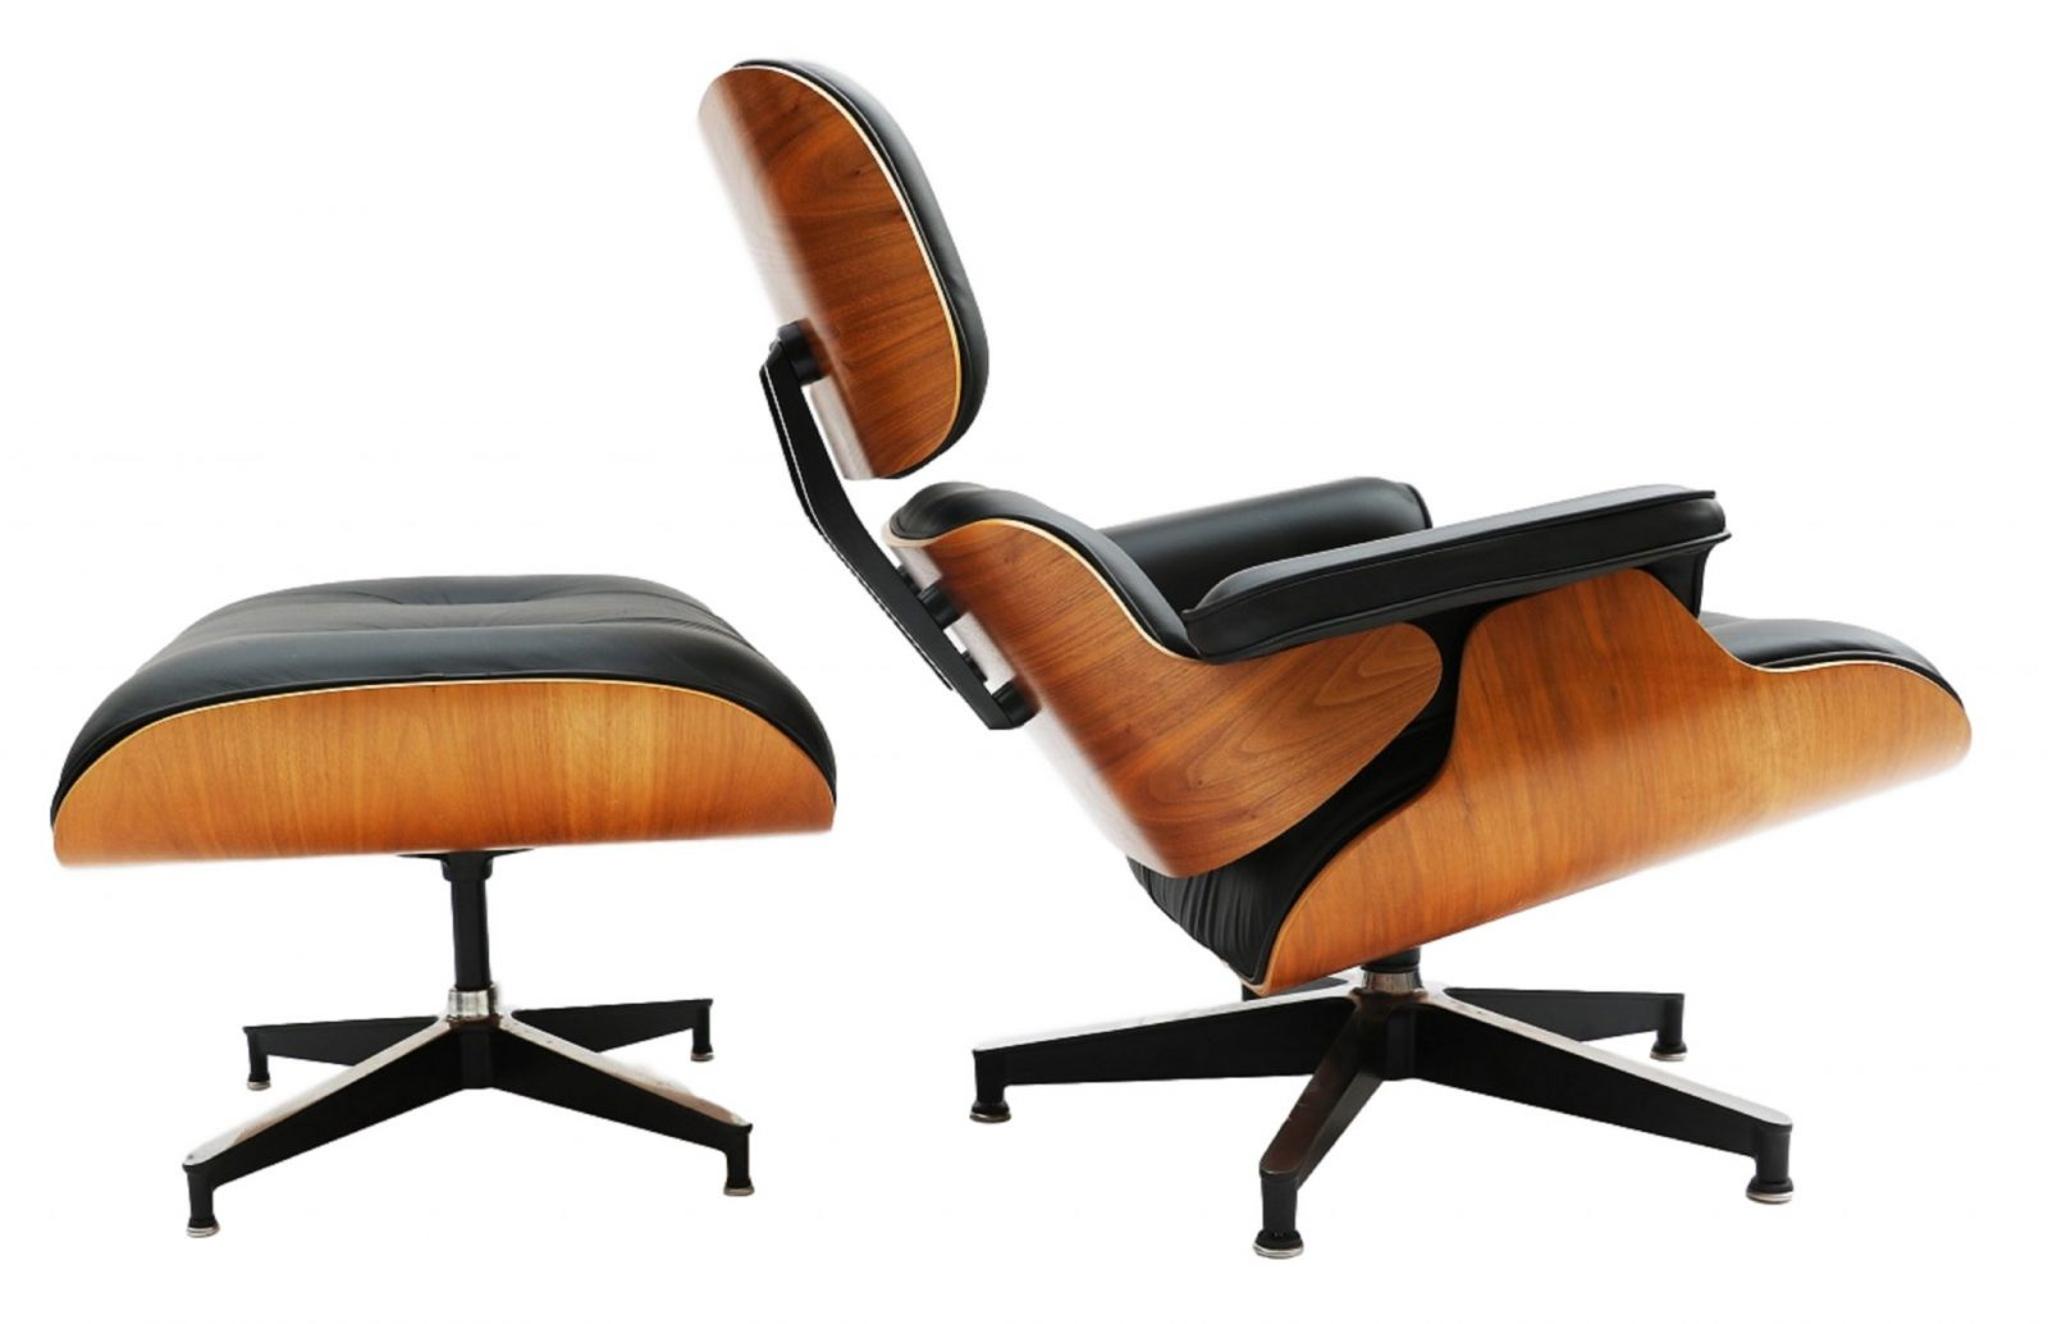 herman miller eames lounge chair and ottoman model 670 671. Black Bedroom Furniture Sets. Home Design Ideas